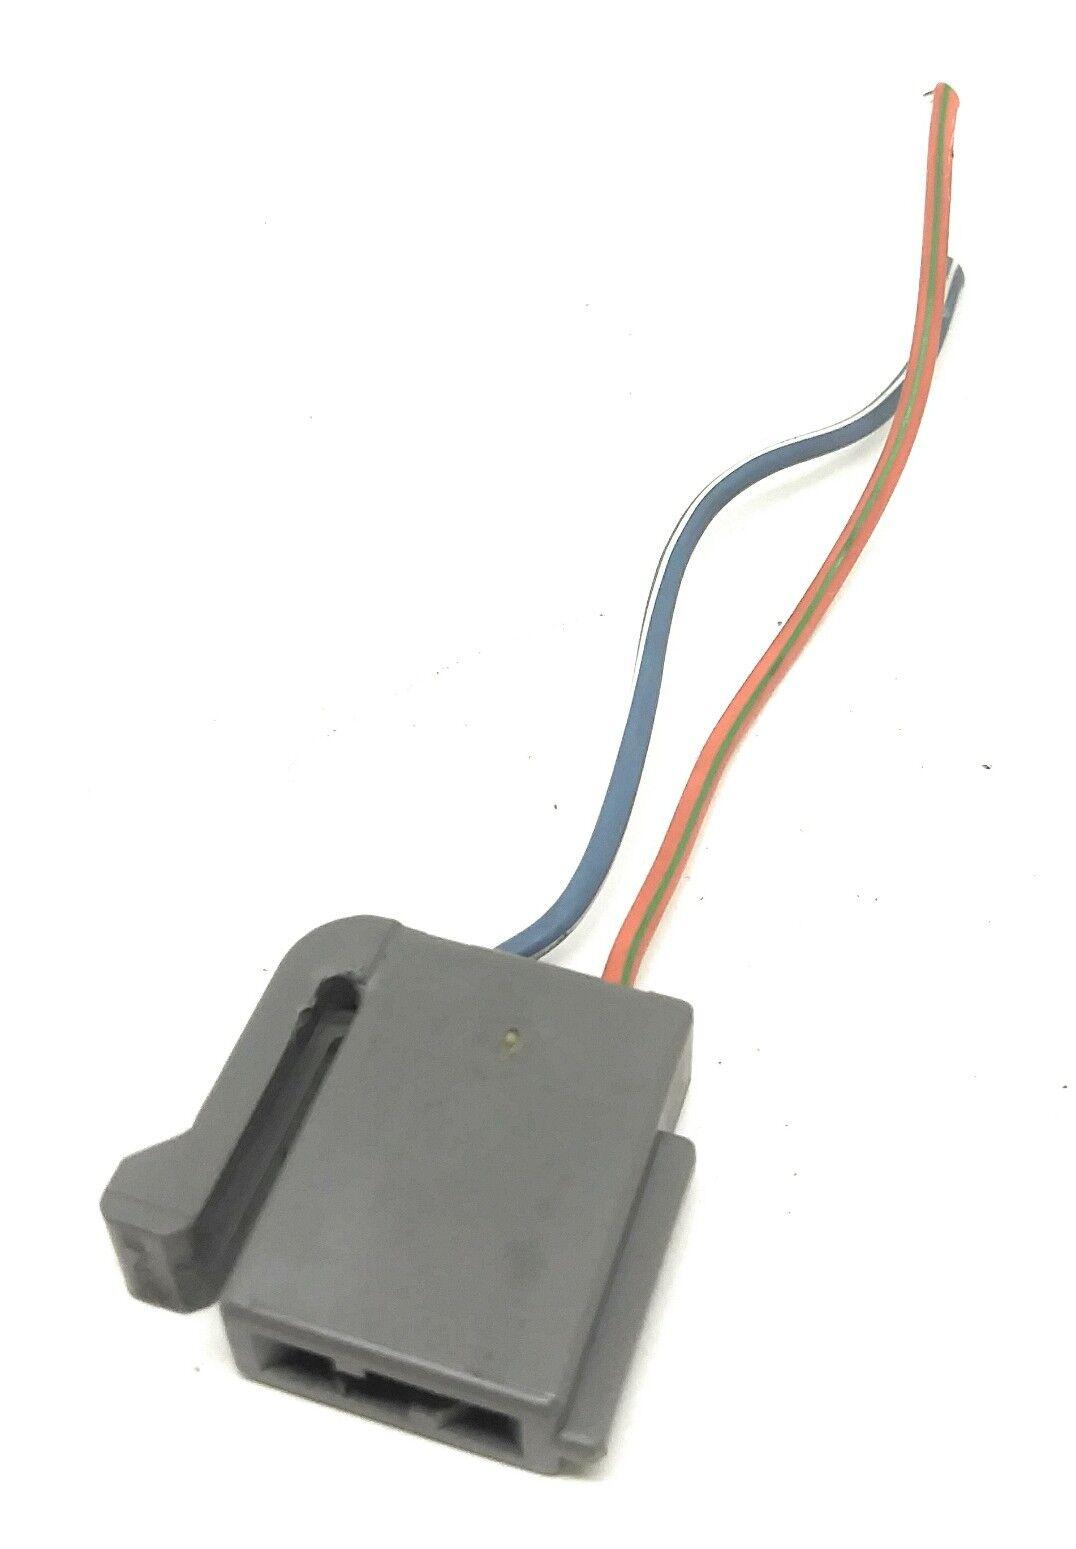 Details about 98-01 Explorer Ranger Door Speaker #F87F18808AB Wire on